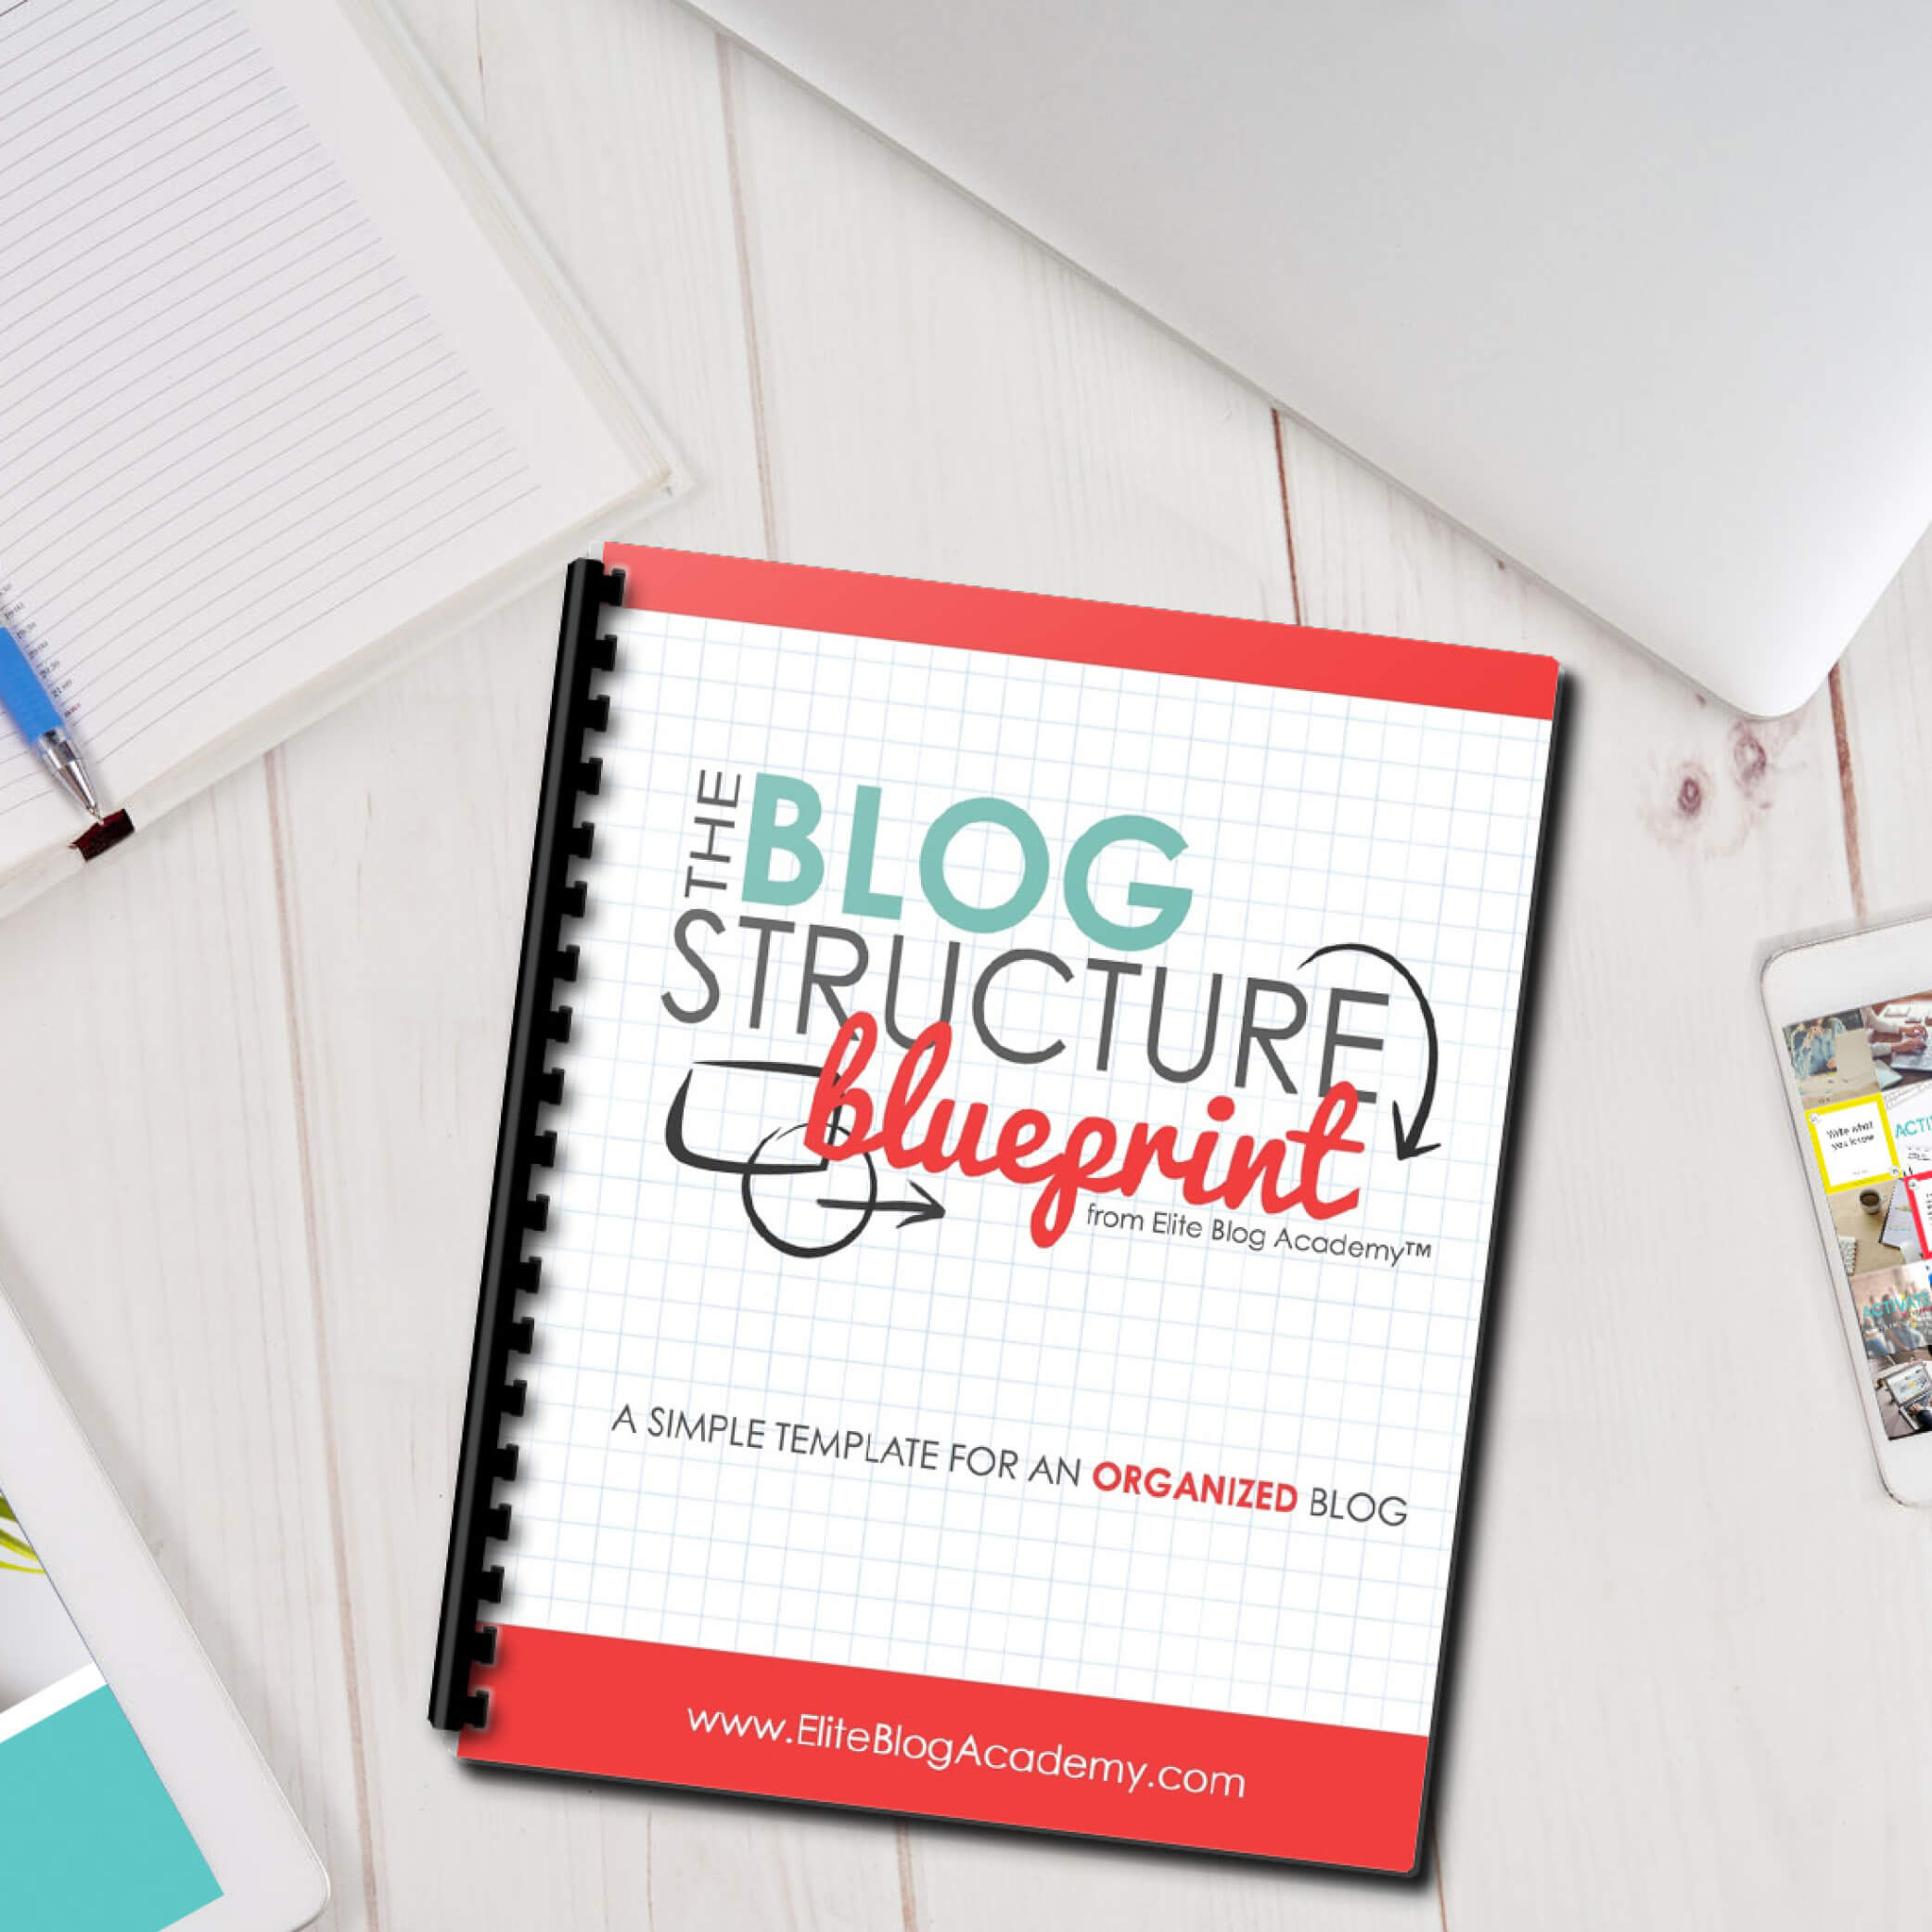 The Blog Structure Blueprint